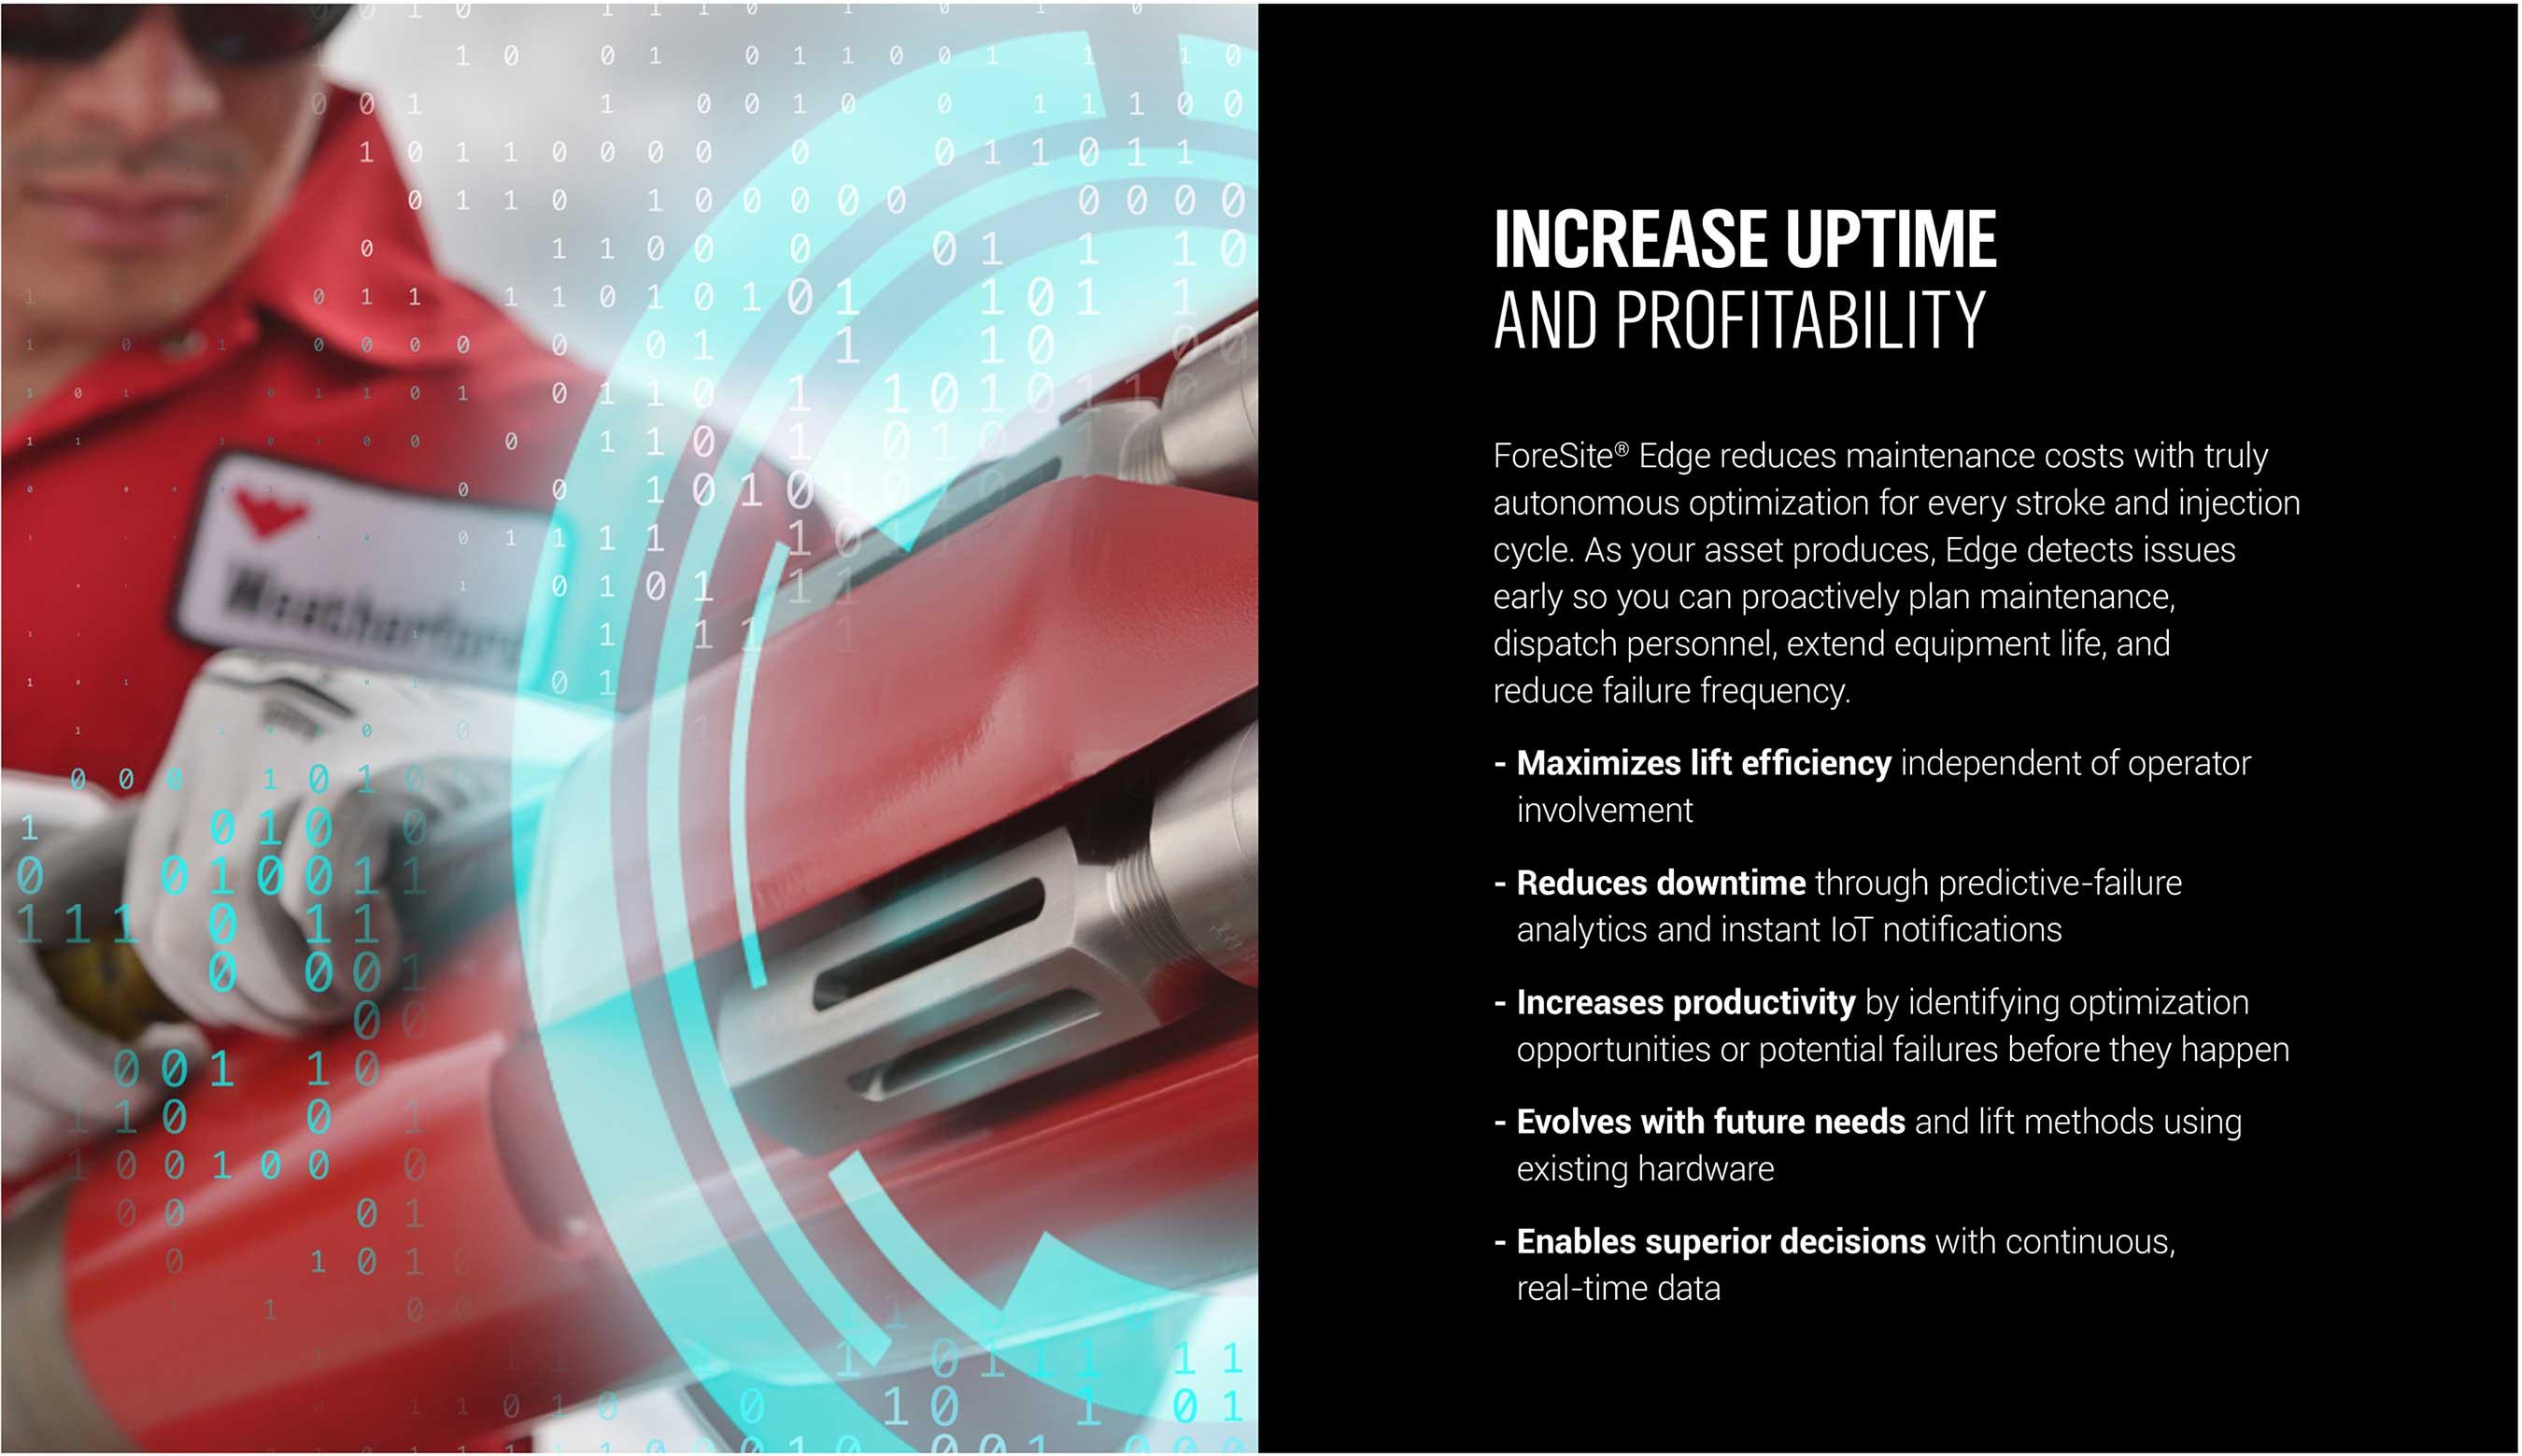 Increase uptime and profitability